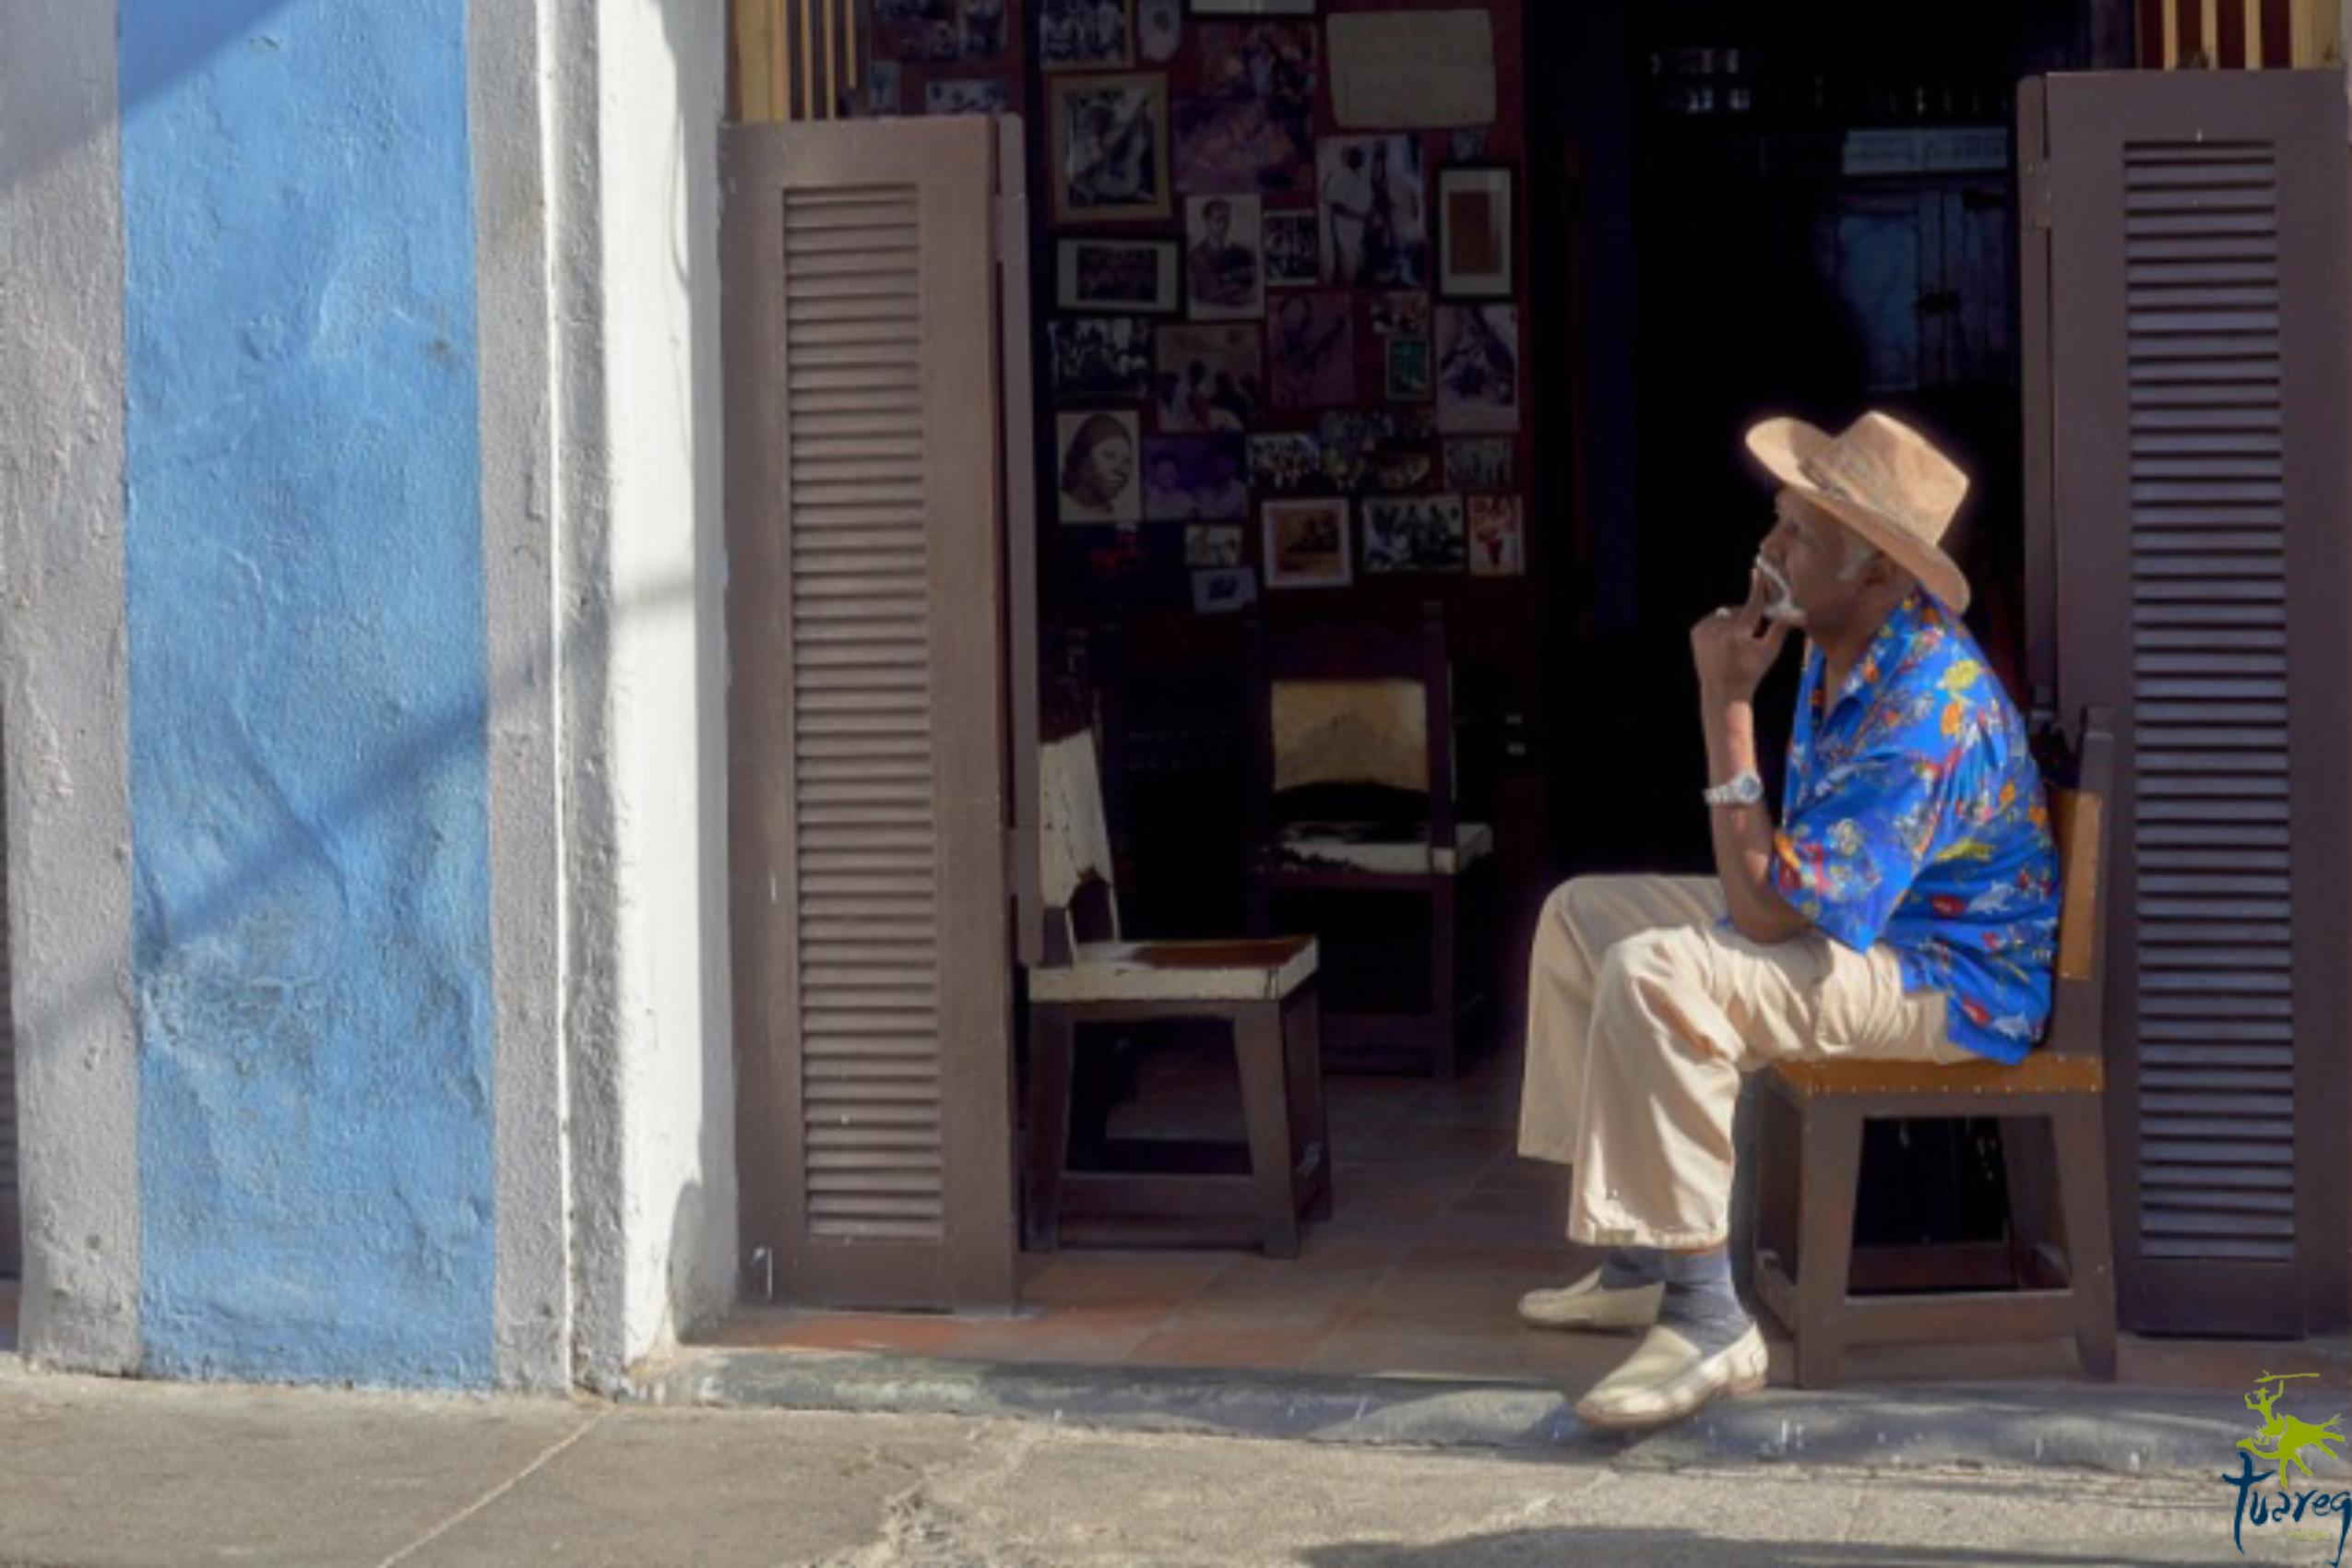 Viaje a Cuba viajes Tuareg | Josep Guardia - Casa Trova